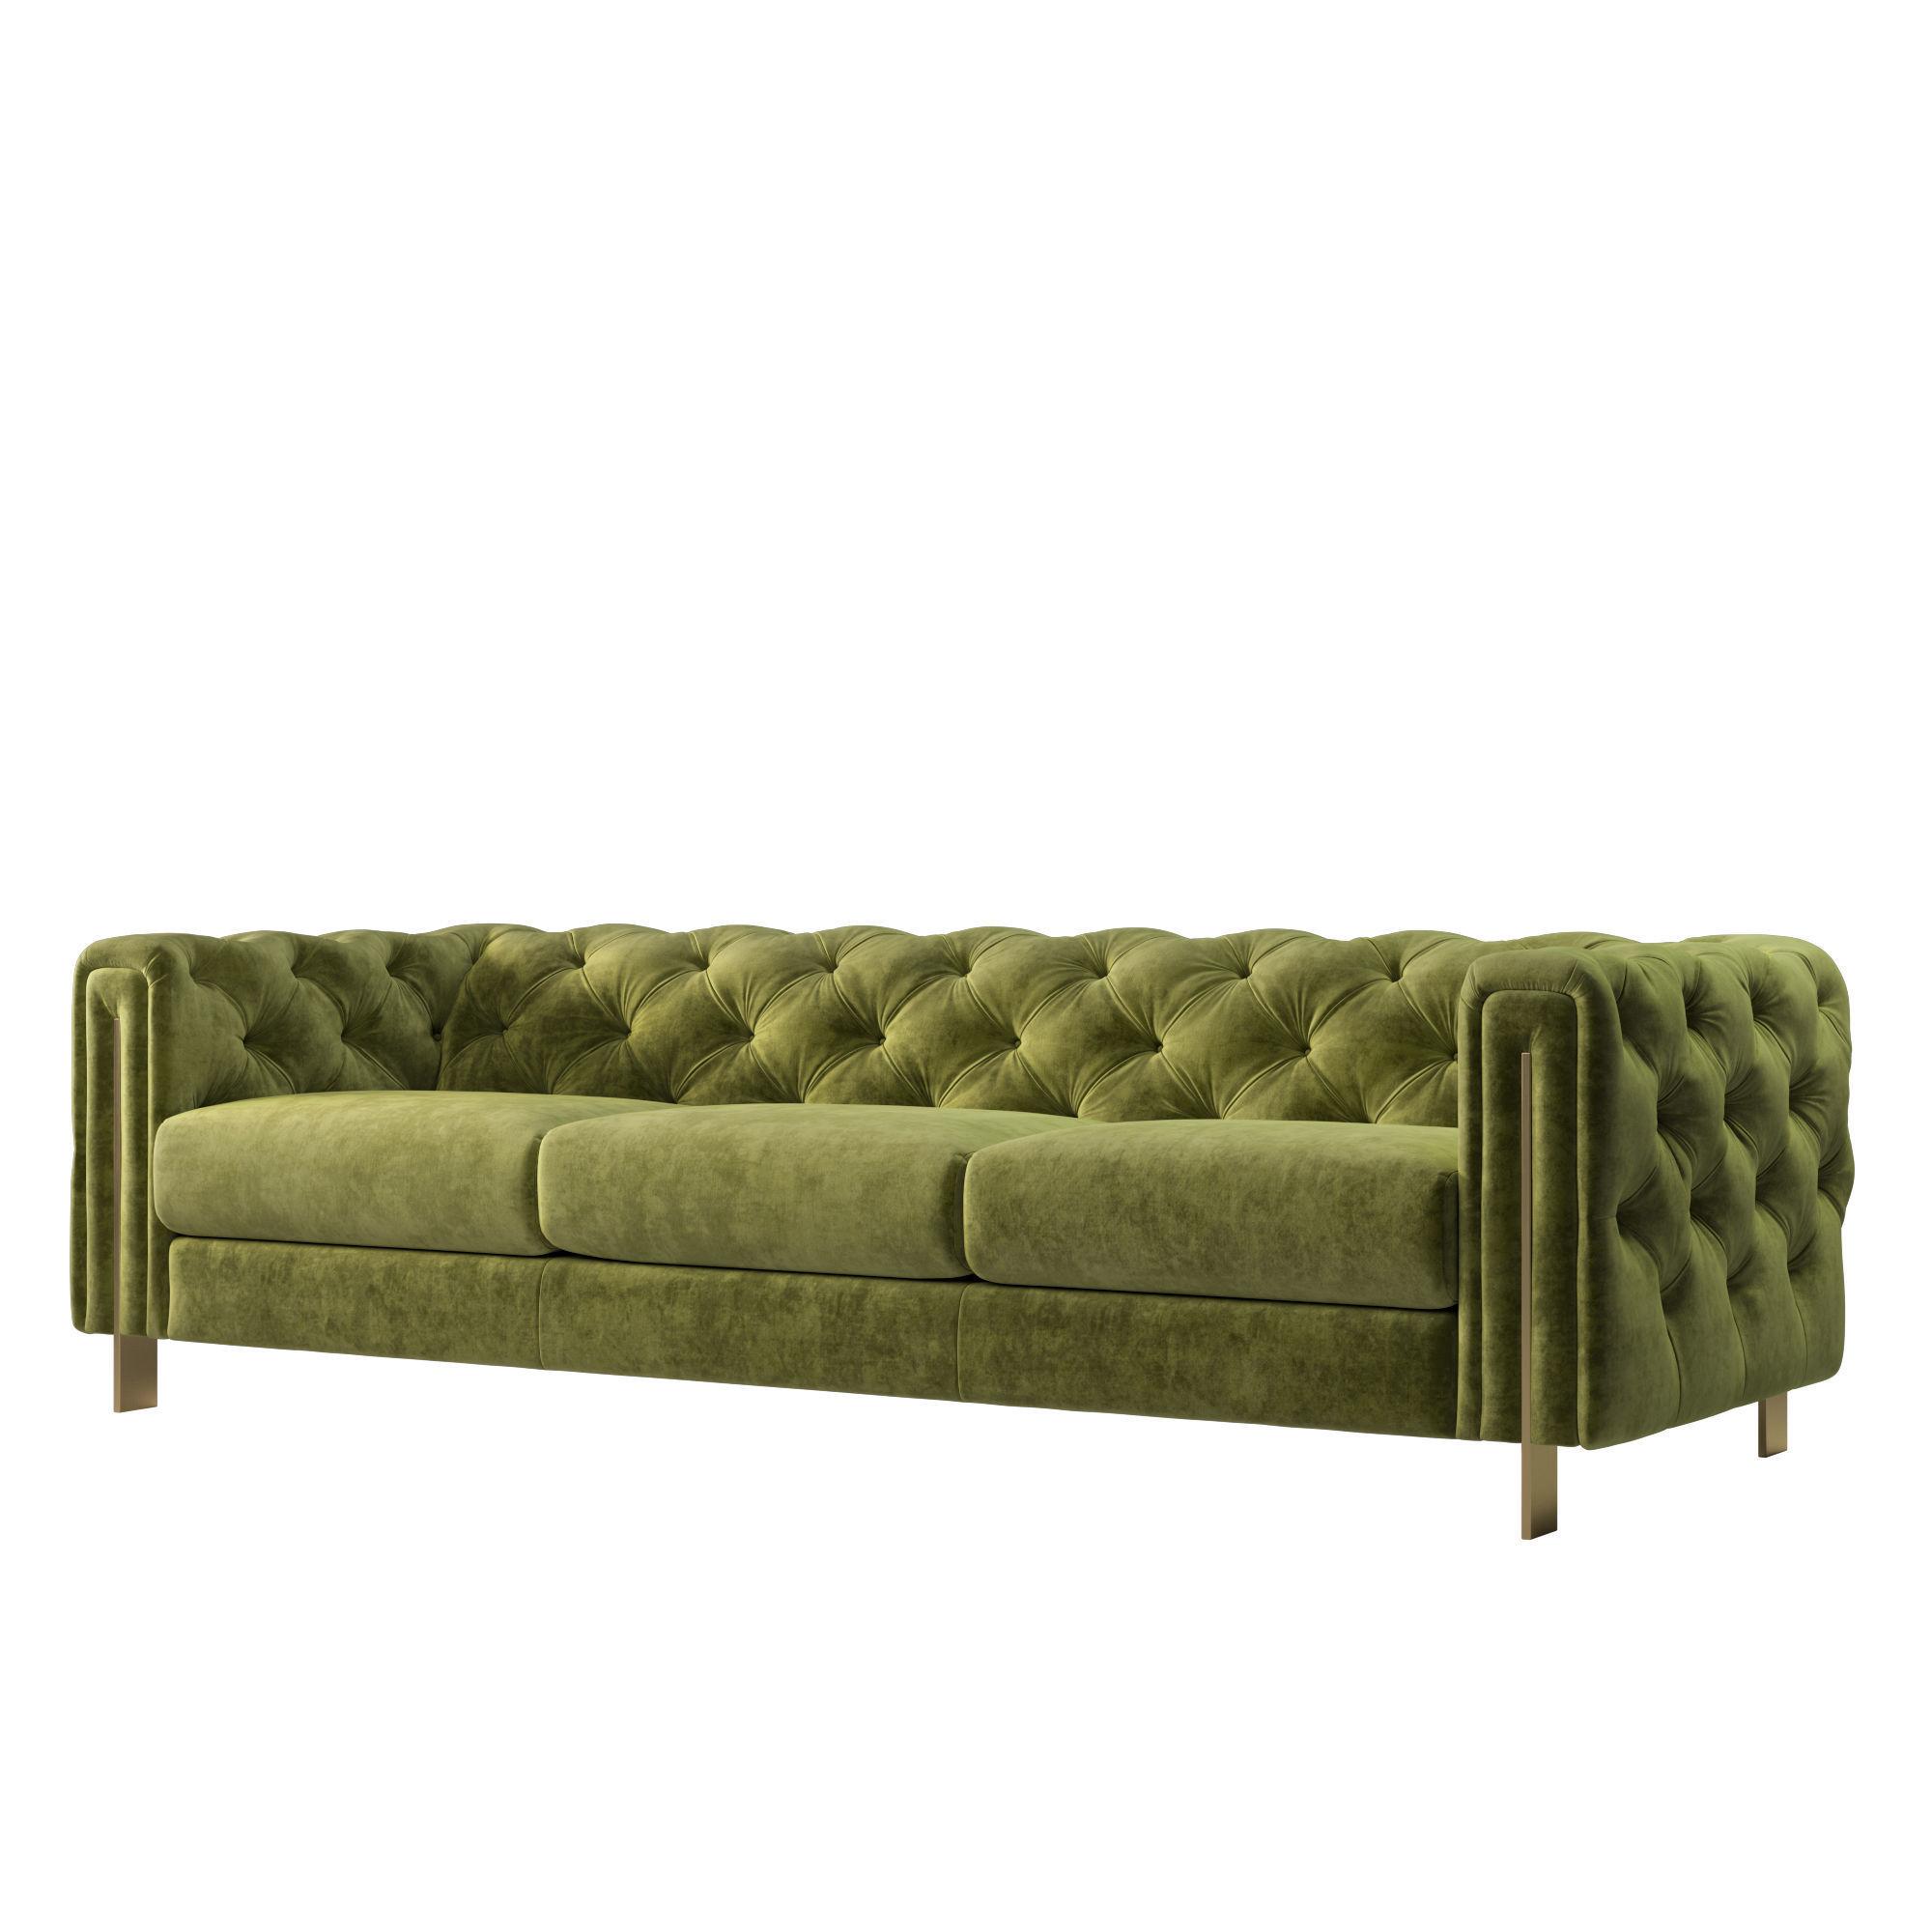 Acanva Luxury Chesterfield Vintage Sofa